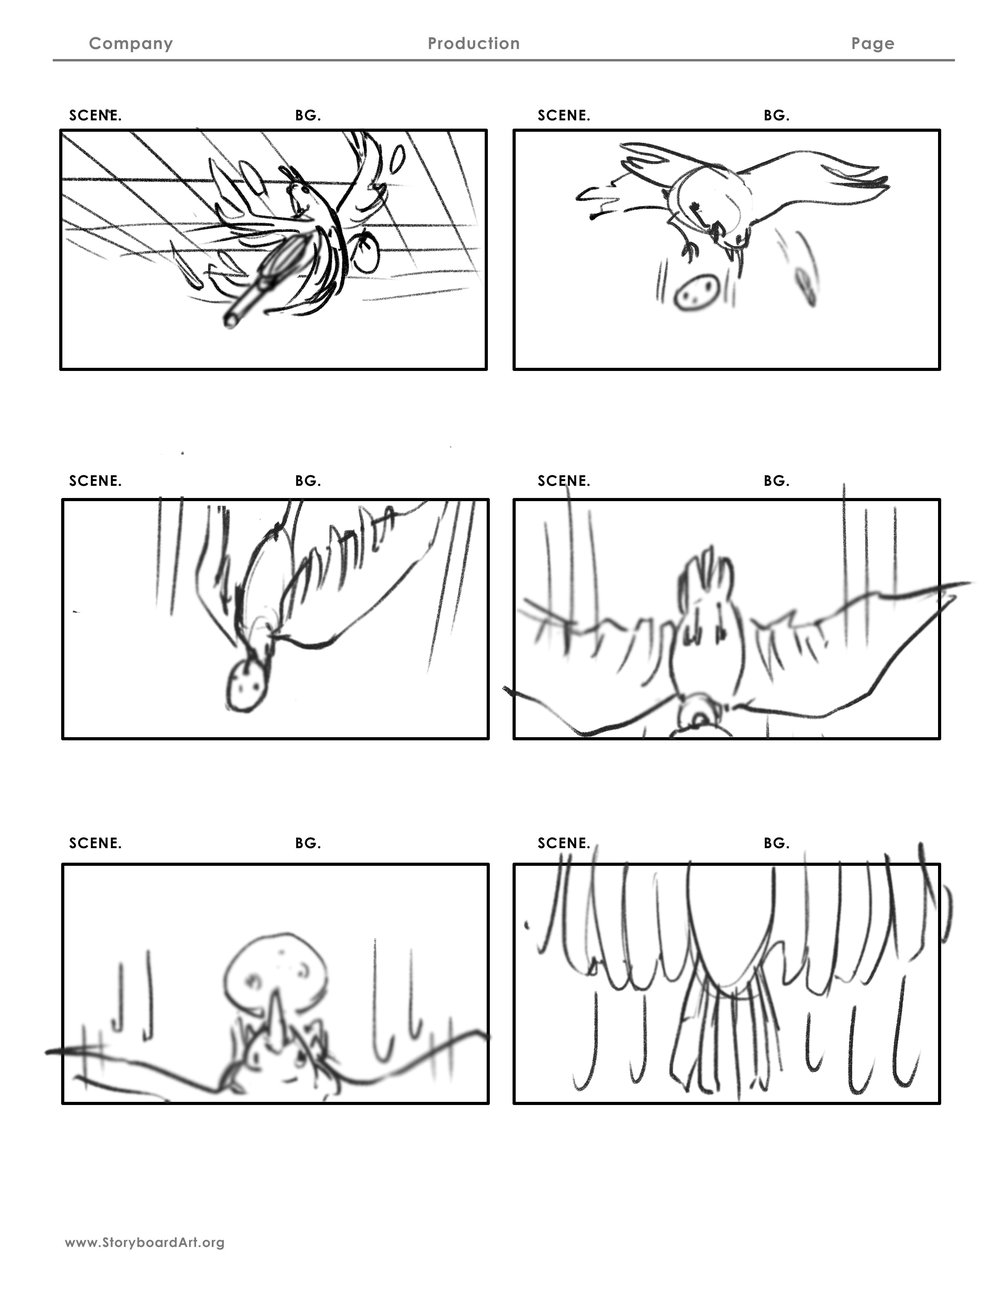 james storyboards page 12.jpg